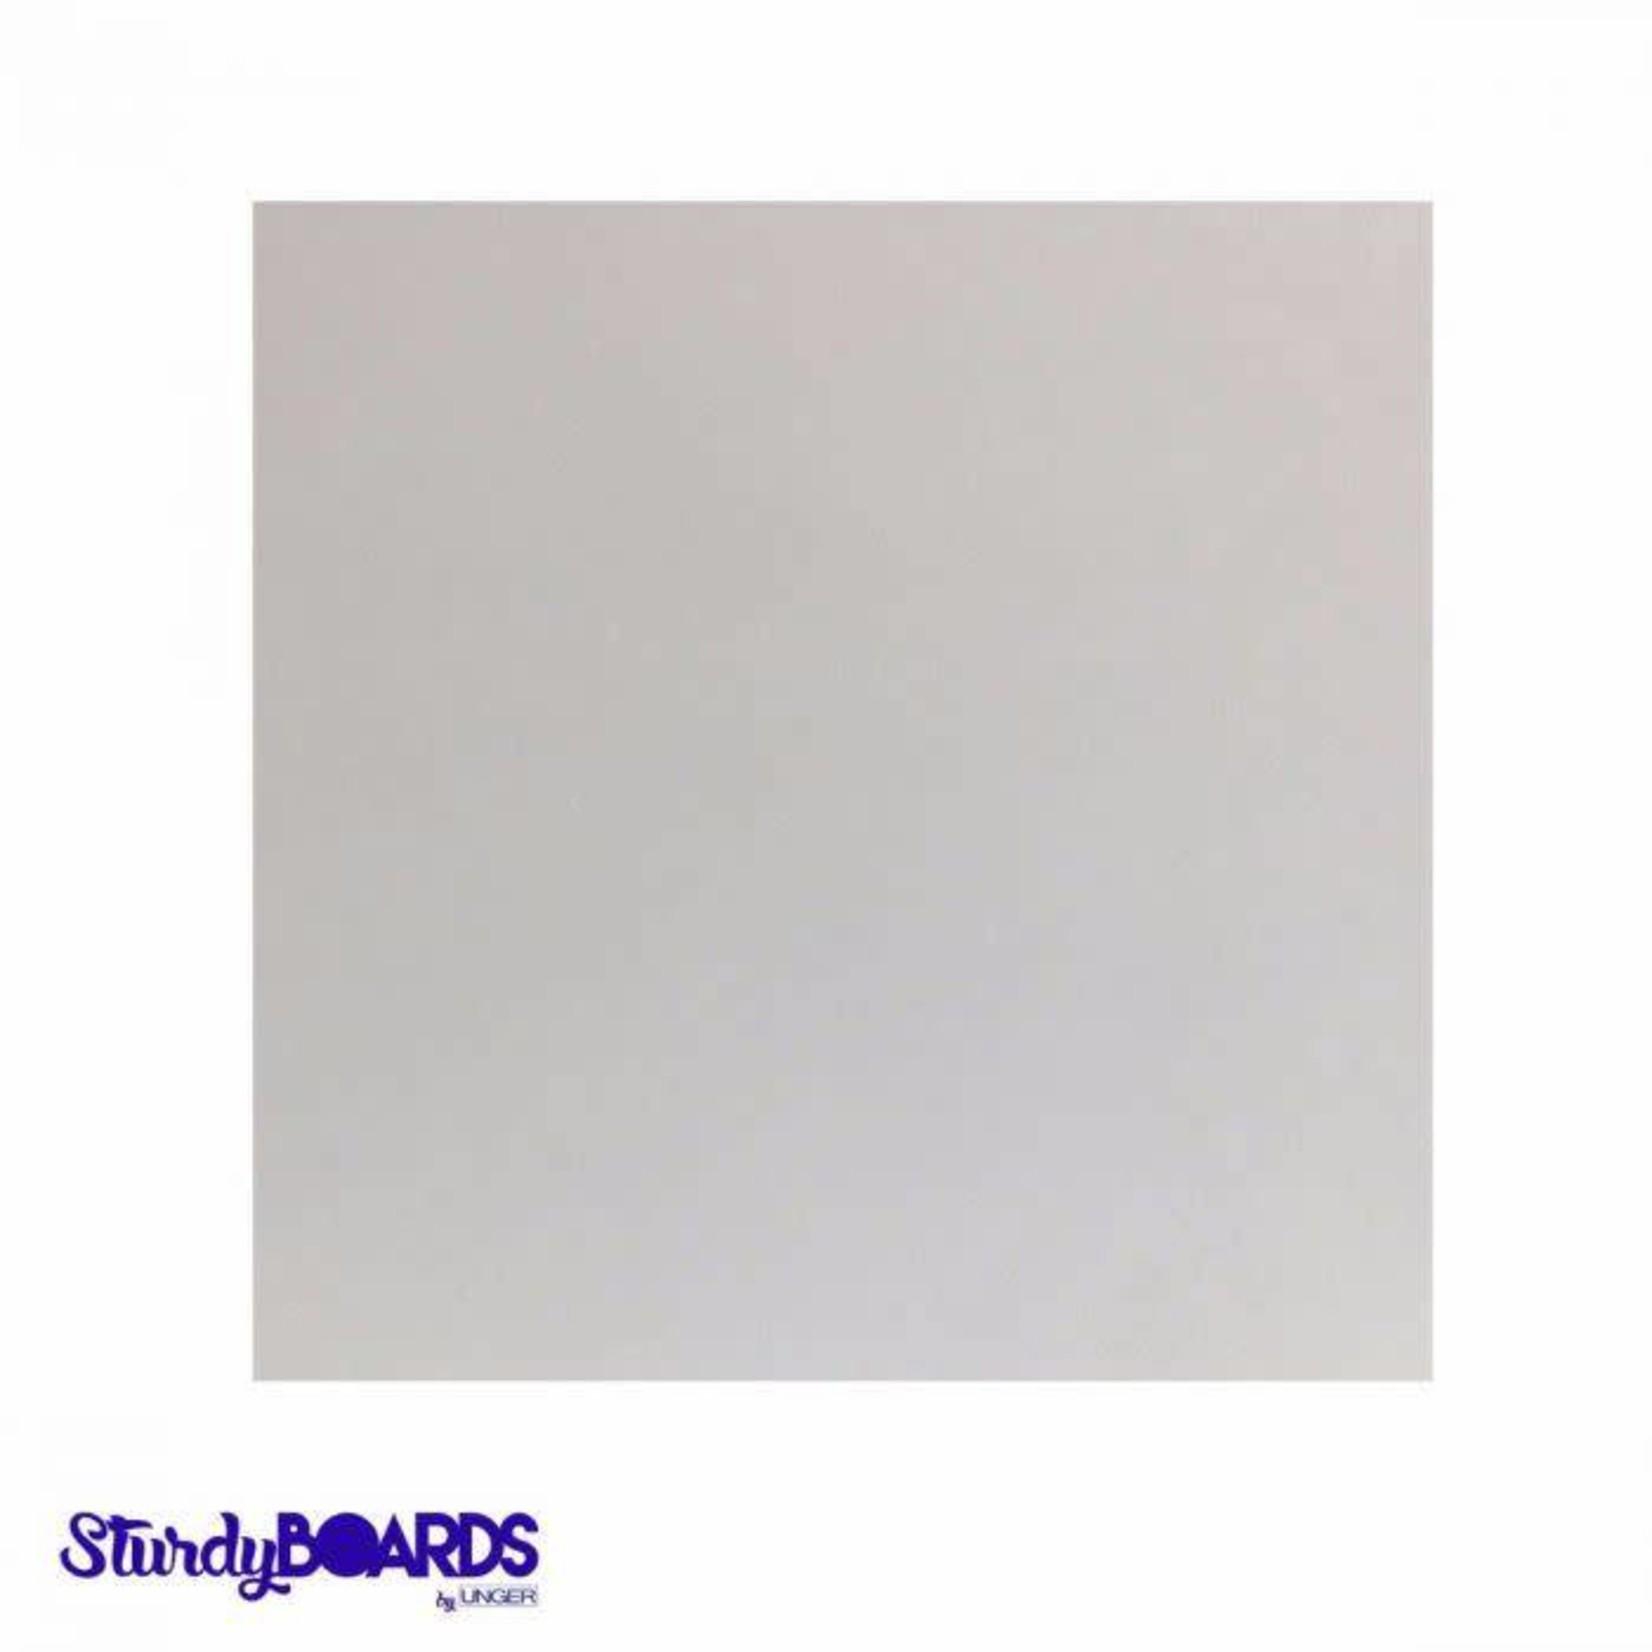 Unger Unger - Sturdy cake board - Square, White - 14''